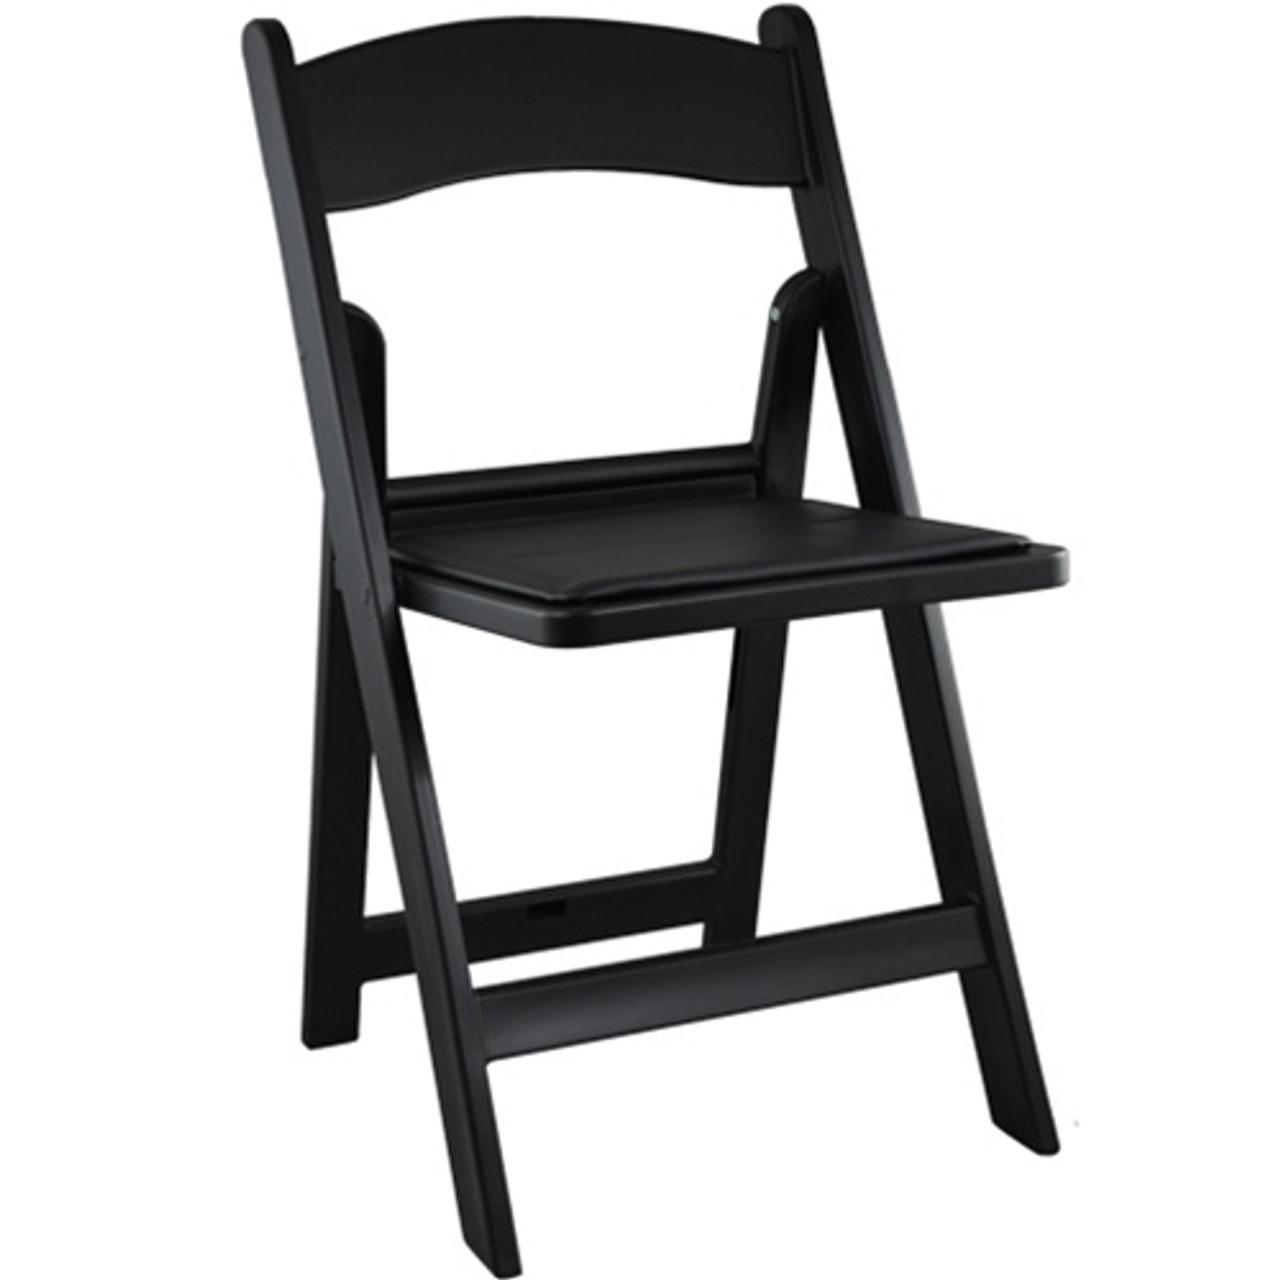 Advantage Black Resin Folding Chairs Black Plastic Folding Chairs For Sale